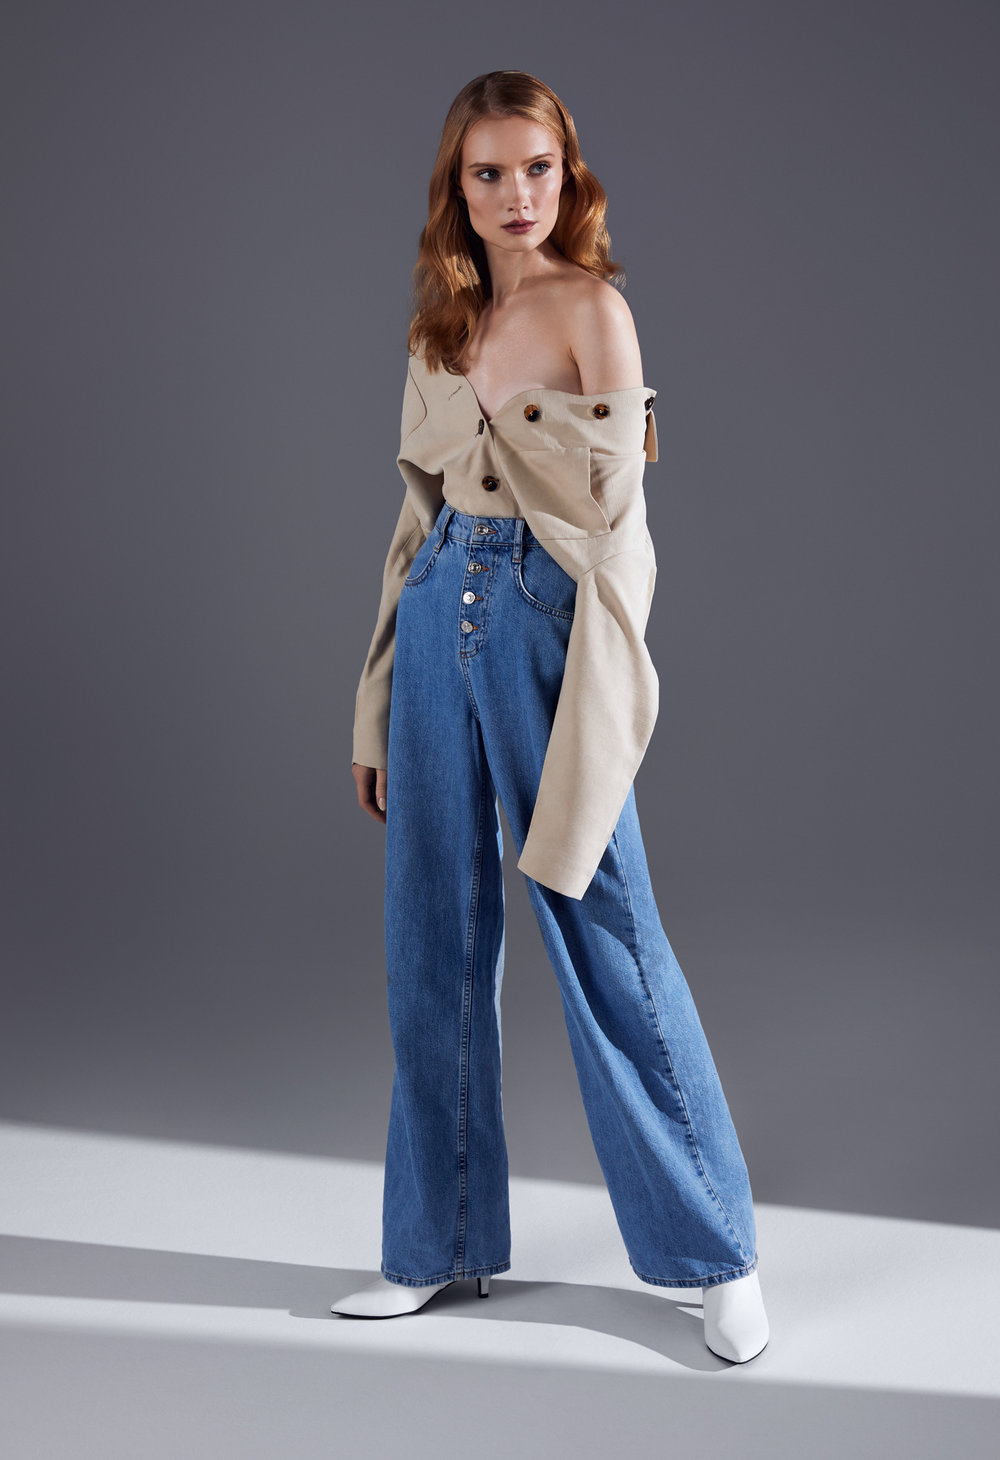 Jeans Mango, shirt H&M, shoes Aldo